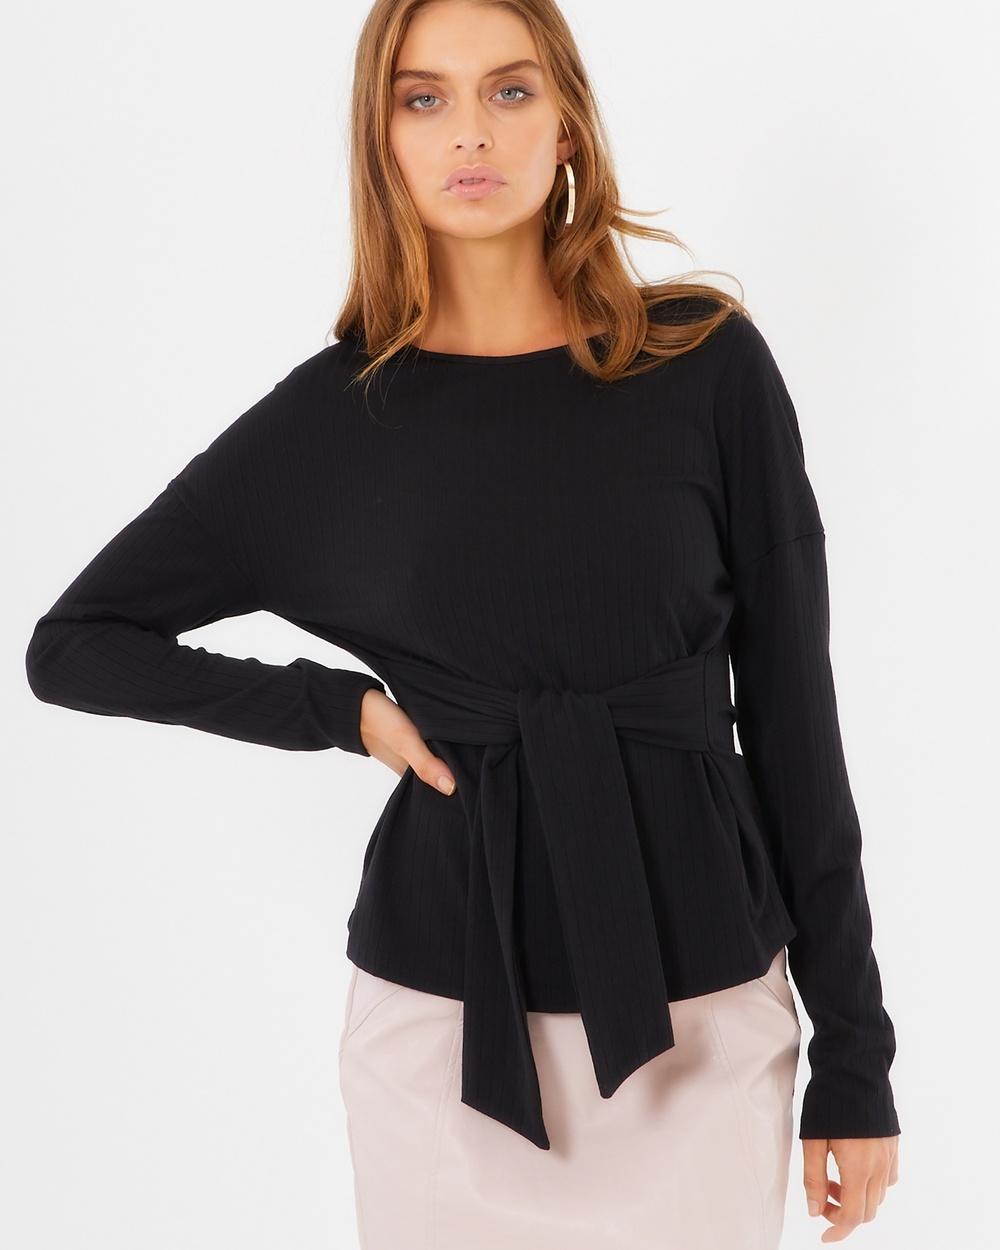 Tussah Rachel Knit Top Tops Black Rachel Knit Top